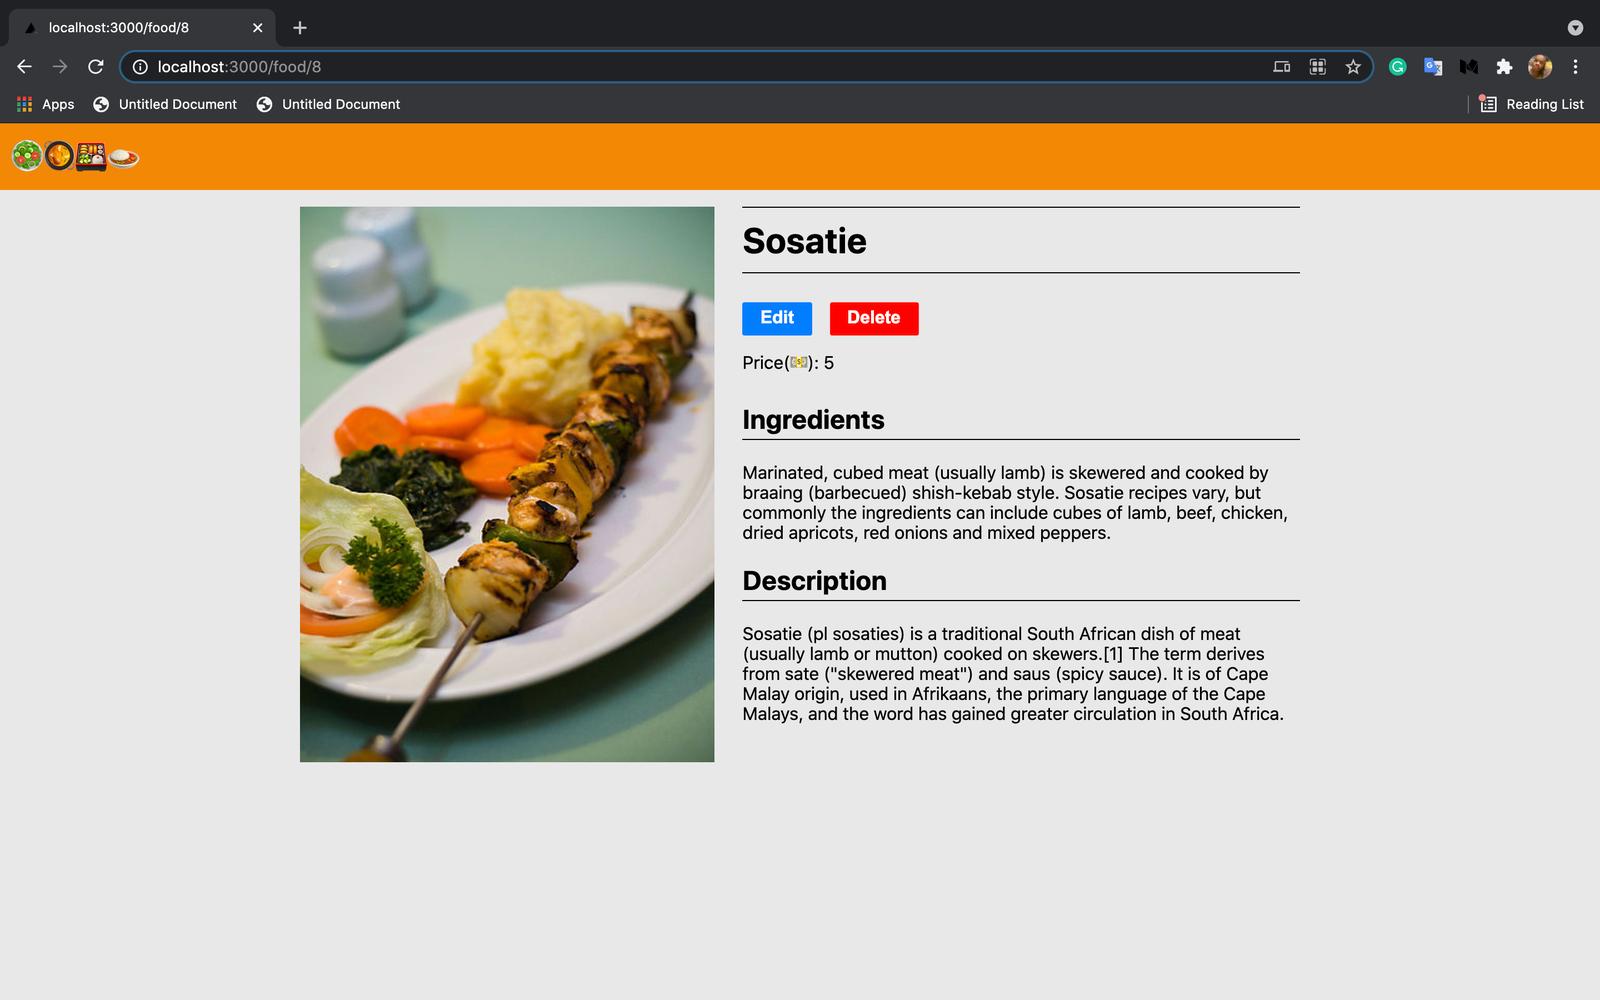 Viewing Sosatie food recipe